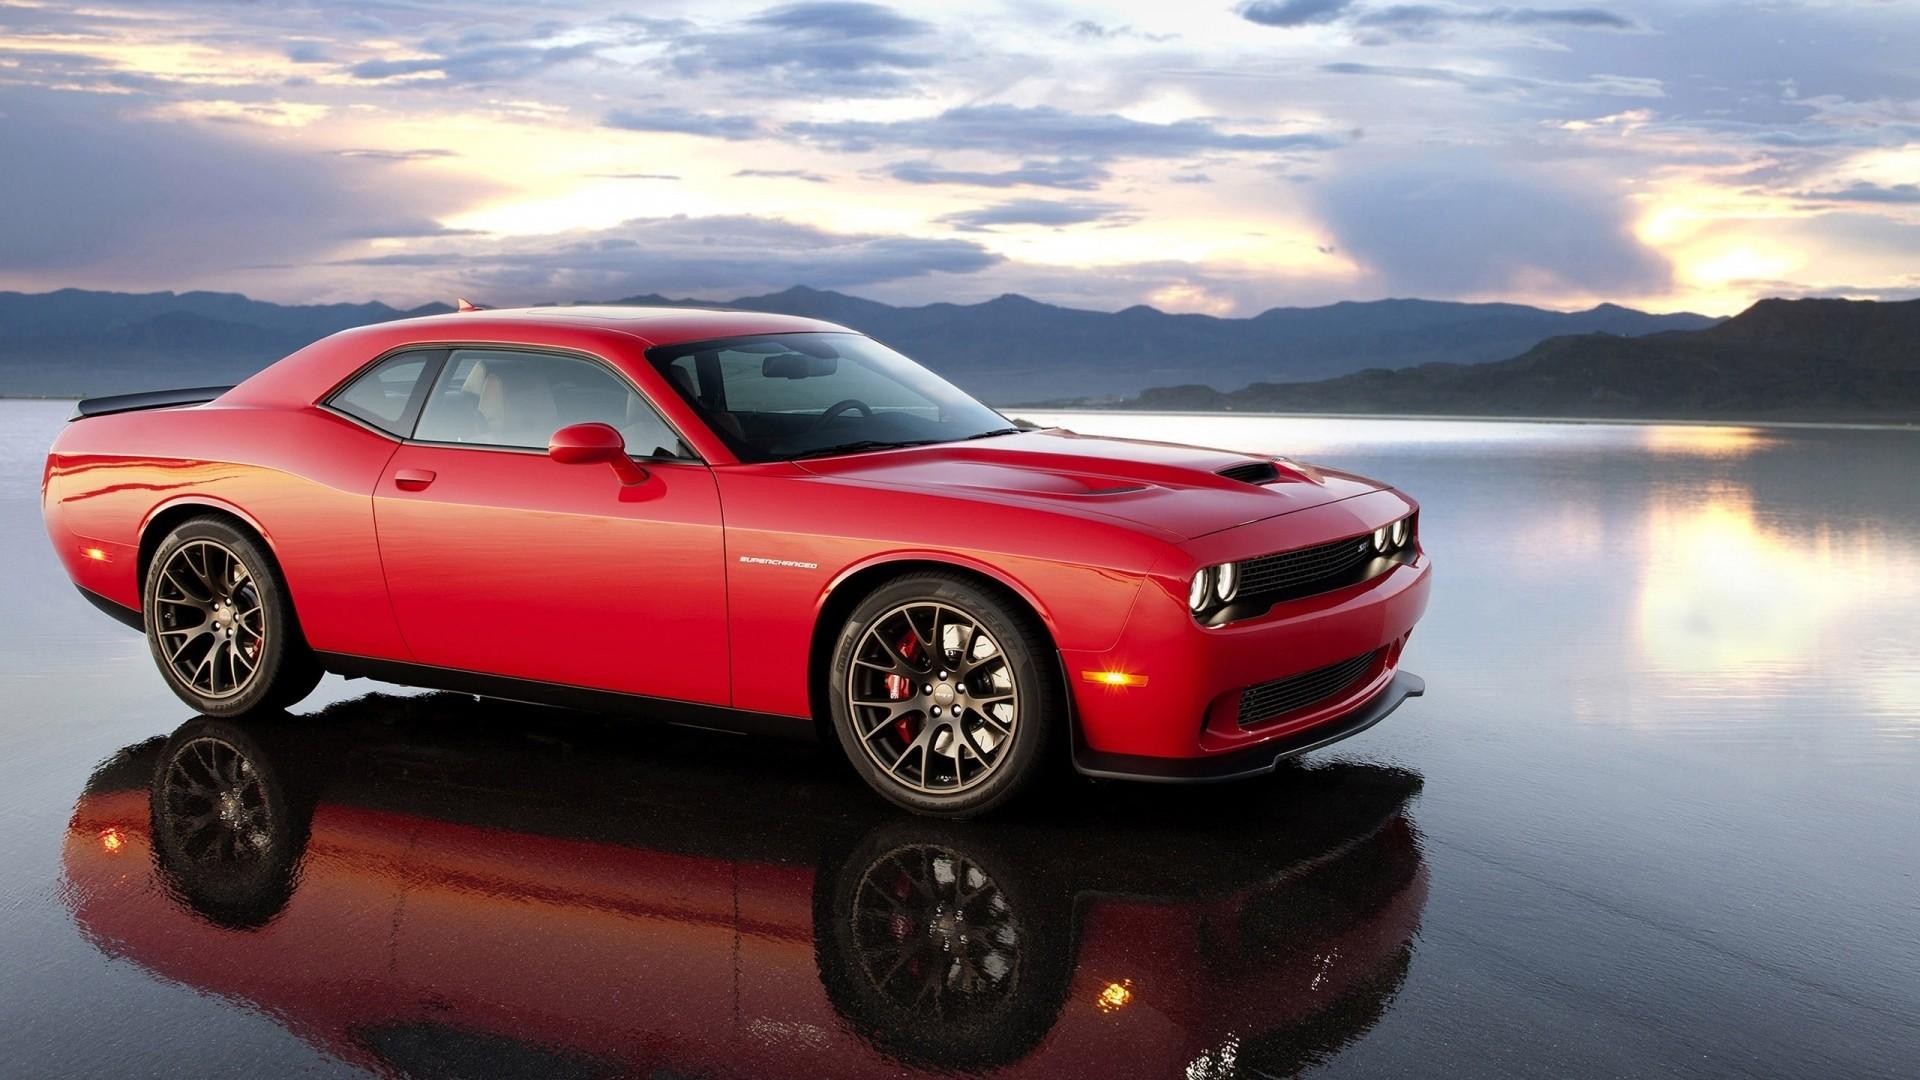 Dodge Challenger Srt Hellcat Wallpaper Free Download